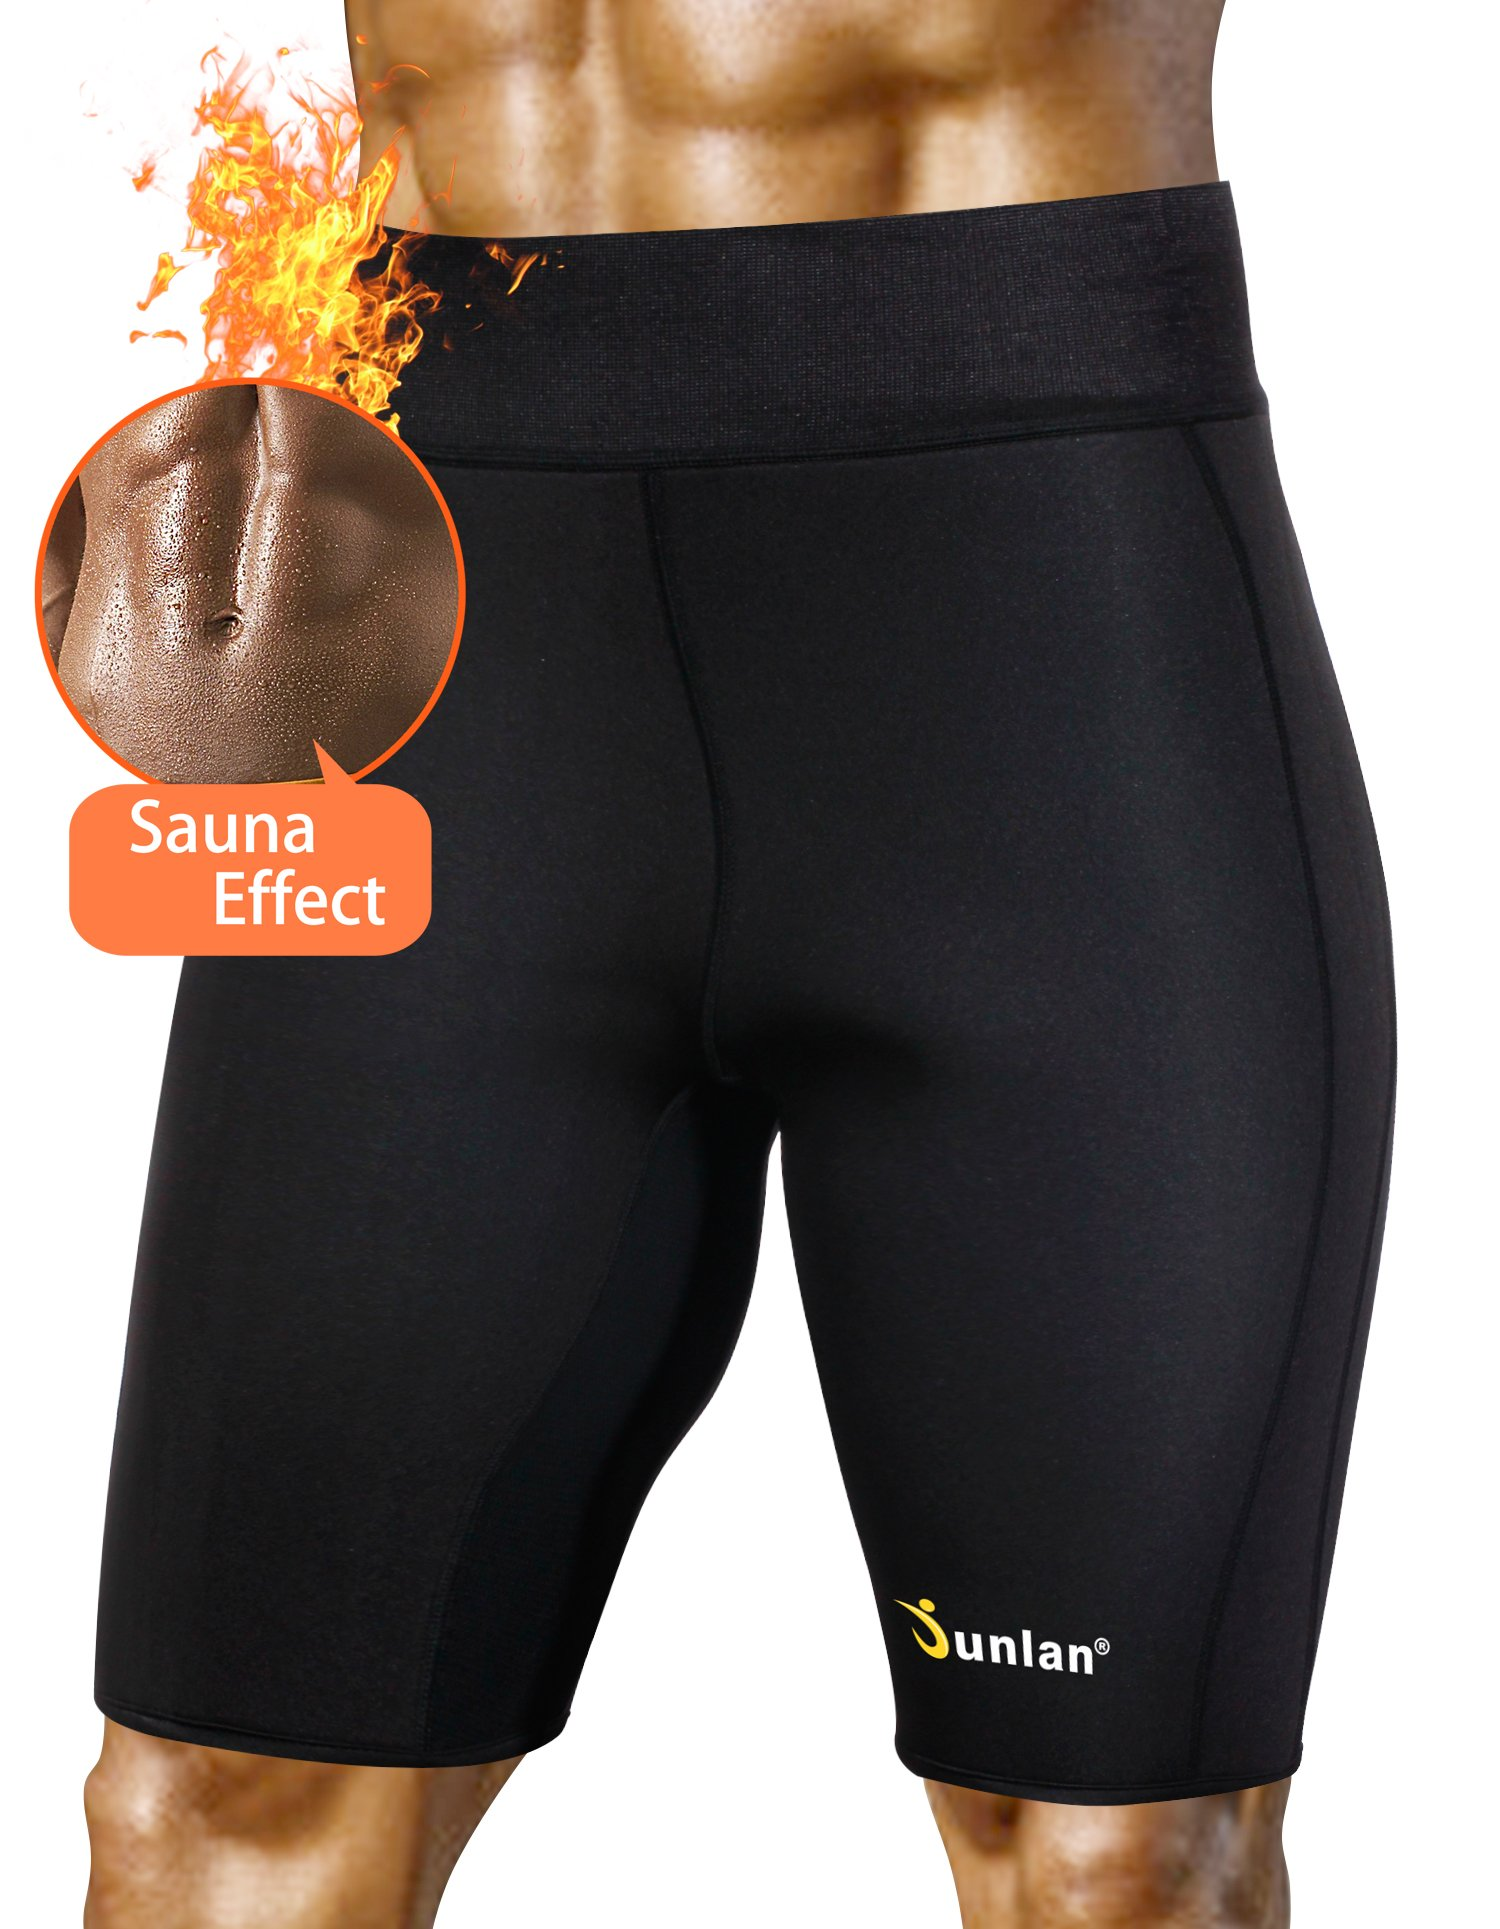 Junlan Men's Weight Loss Sauna Hot Sweat Thermo Shorts Body Shaper Neoprene Athletic Yoga Pants Gym Tummy Fat Burner Slimming (Black, M)